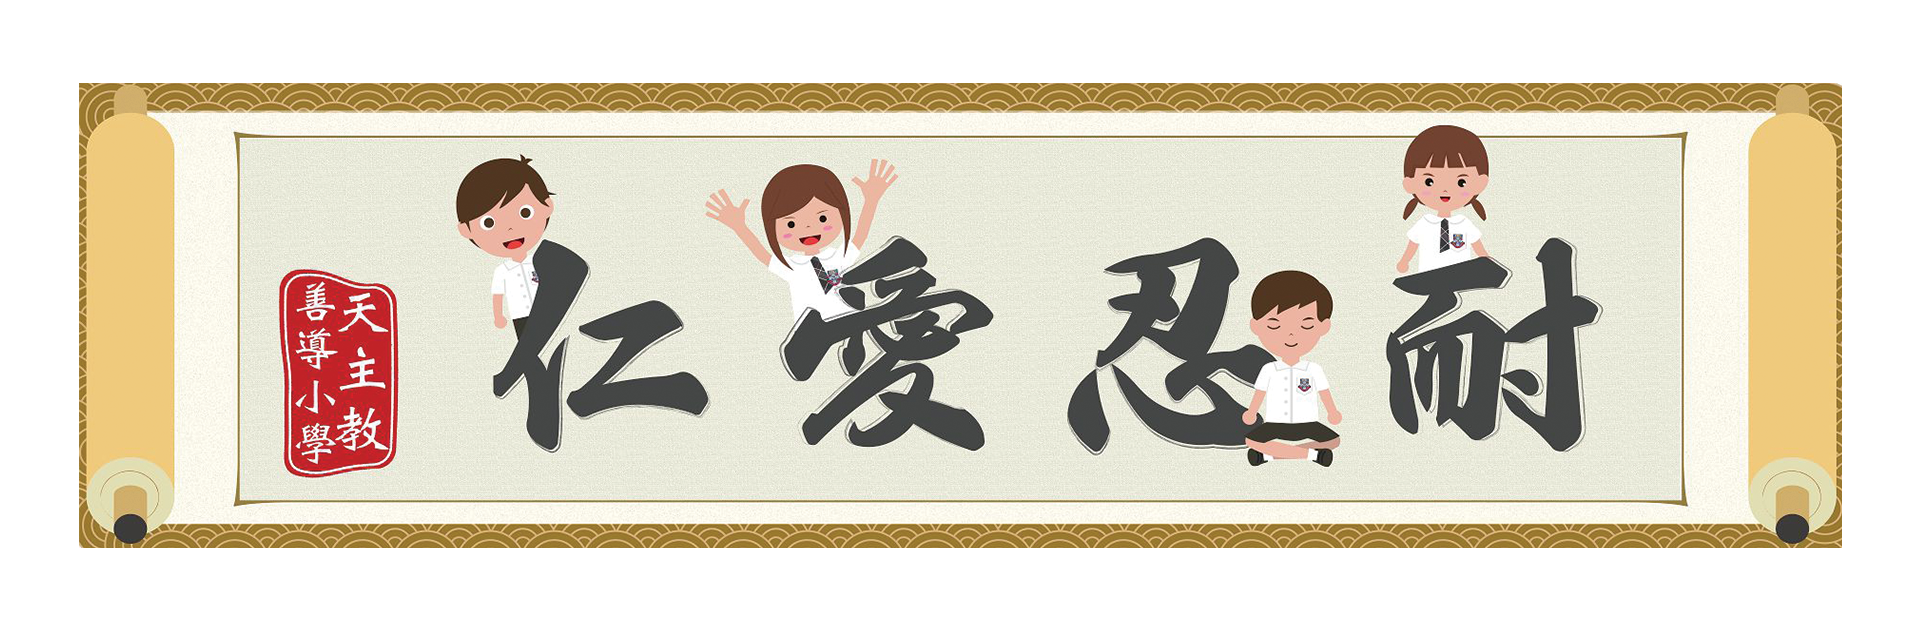 banner 校訓